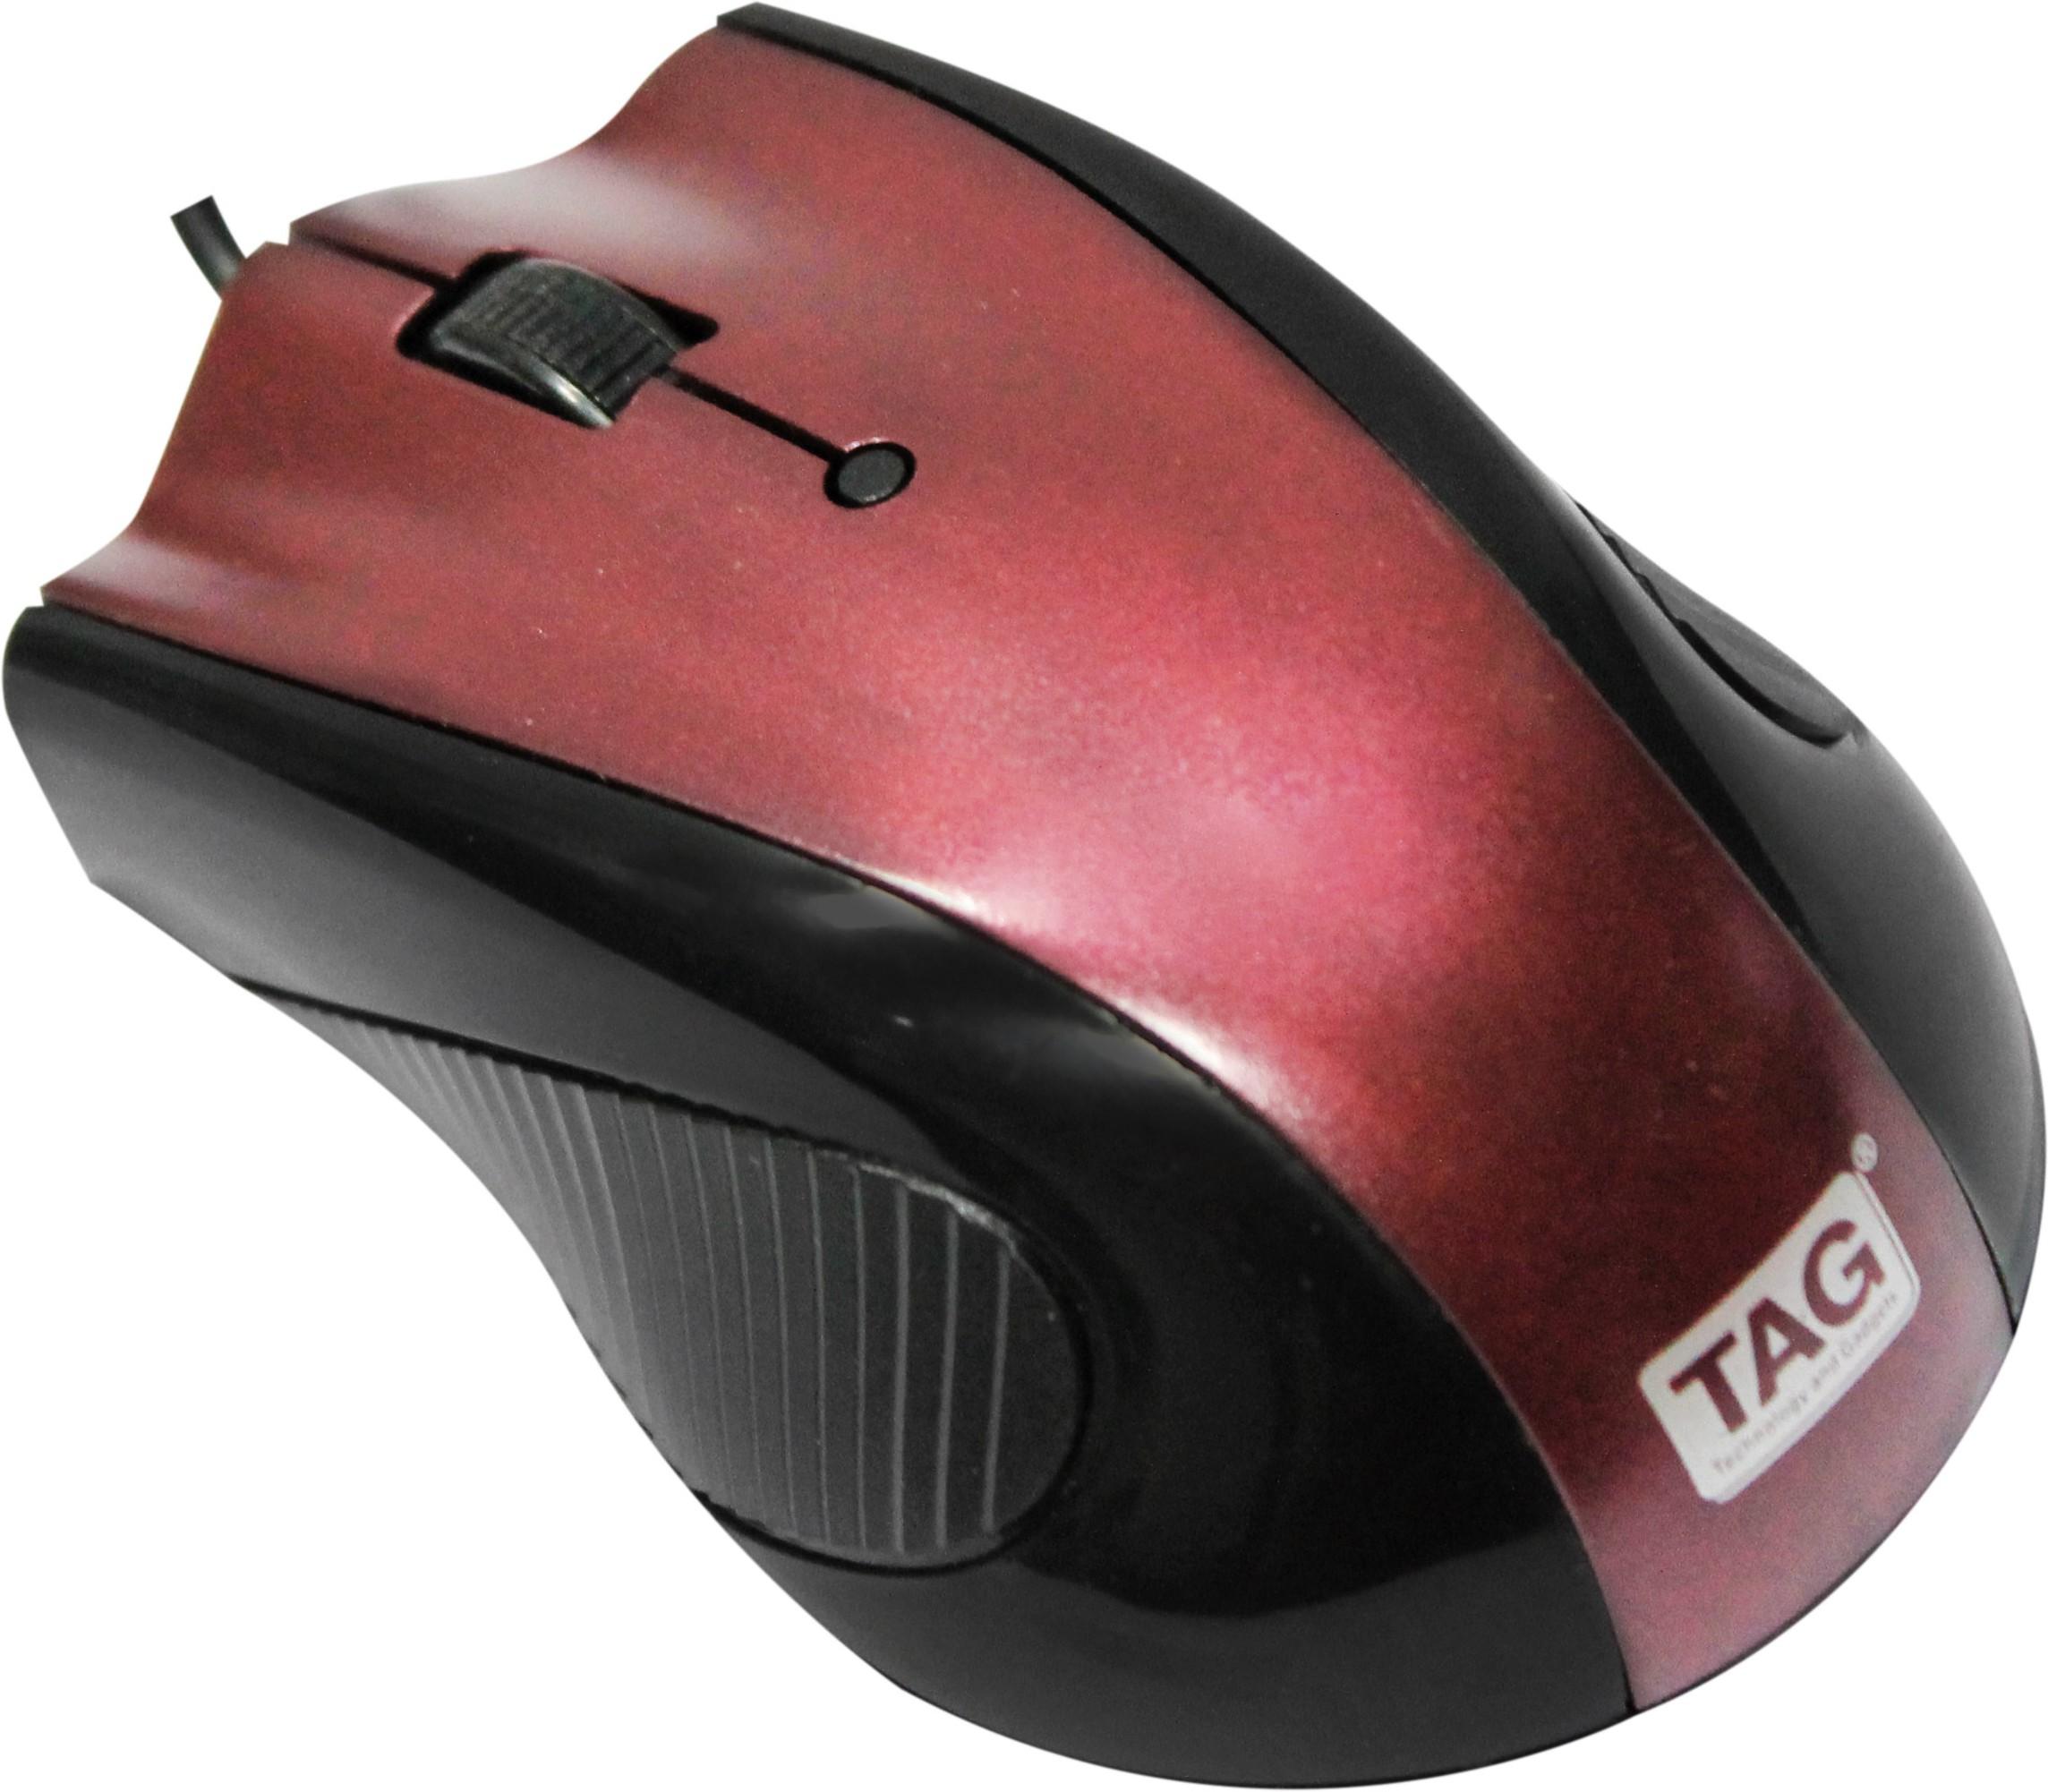 Flipkart - Mouse Just Rs 99